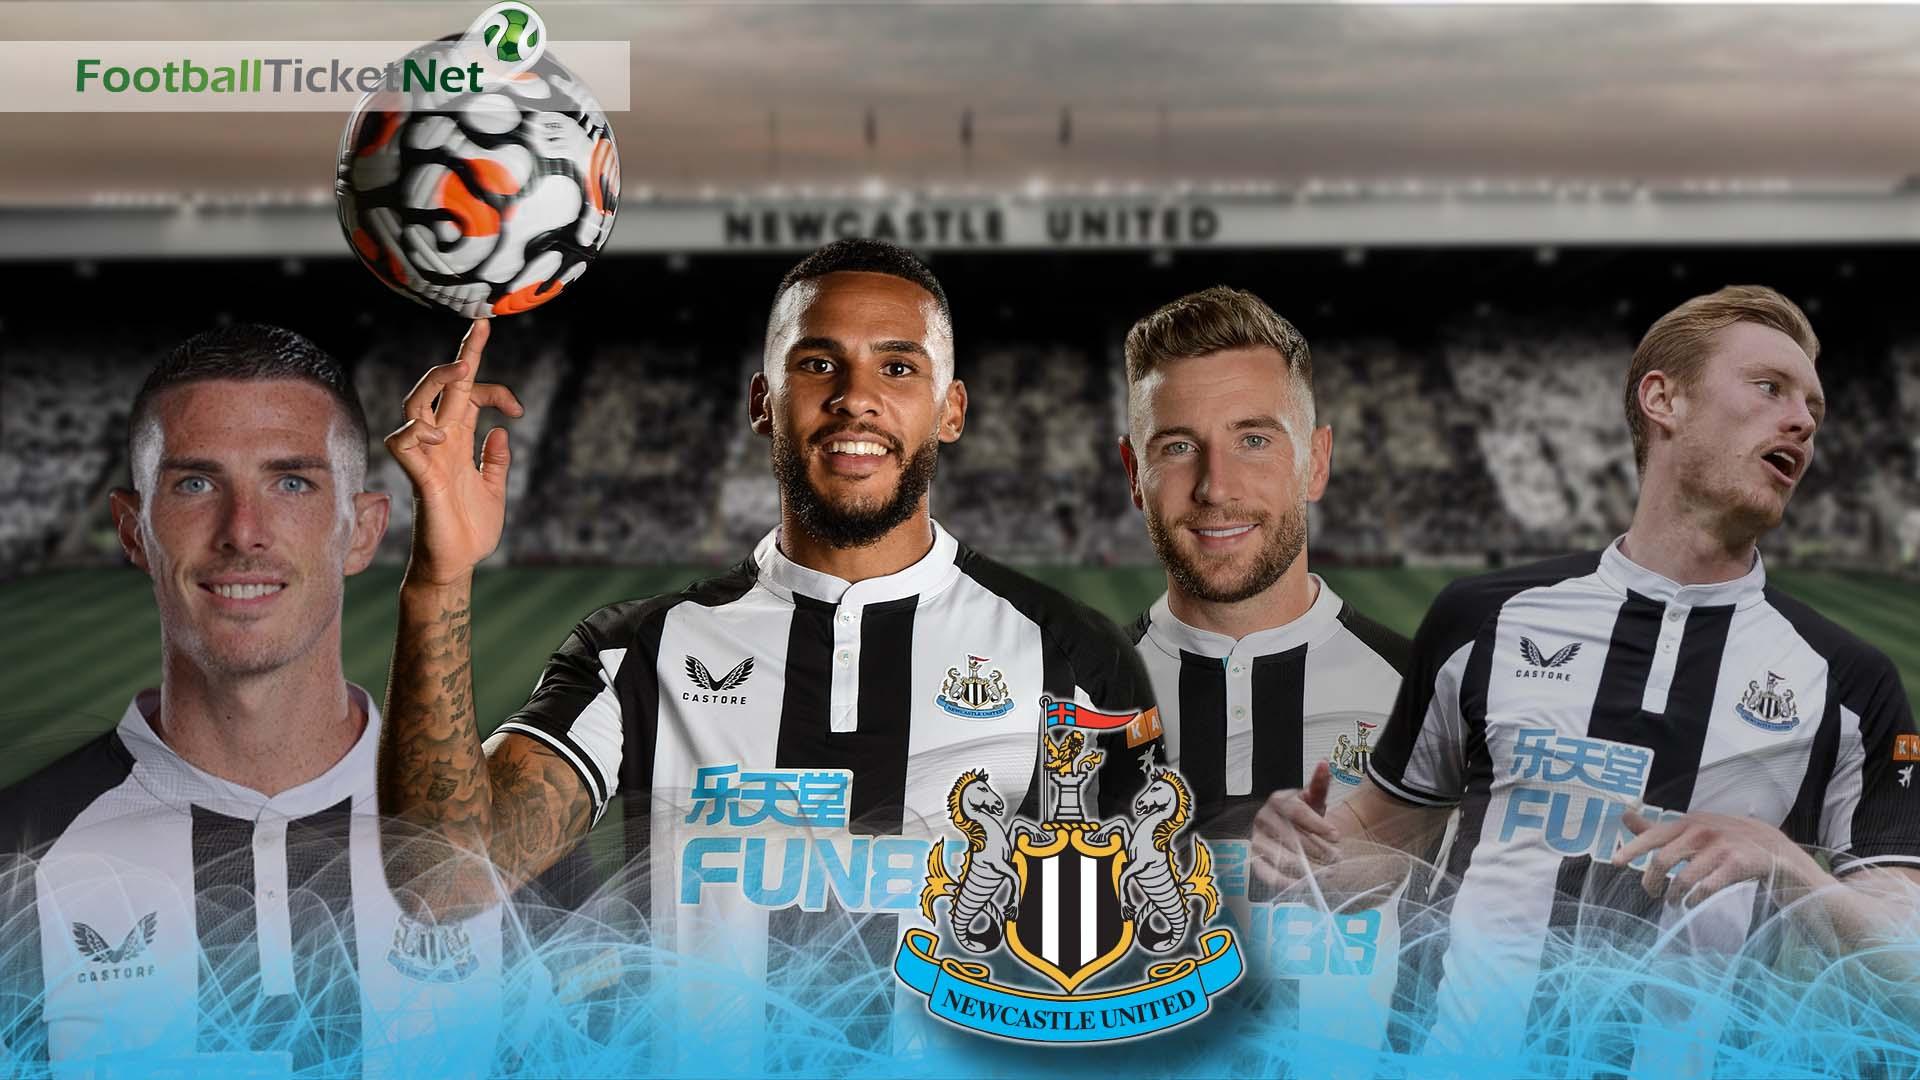 Buy Newcastle United Tickets 2020 21 Football Ticket Net